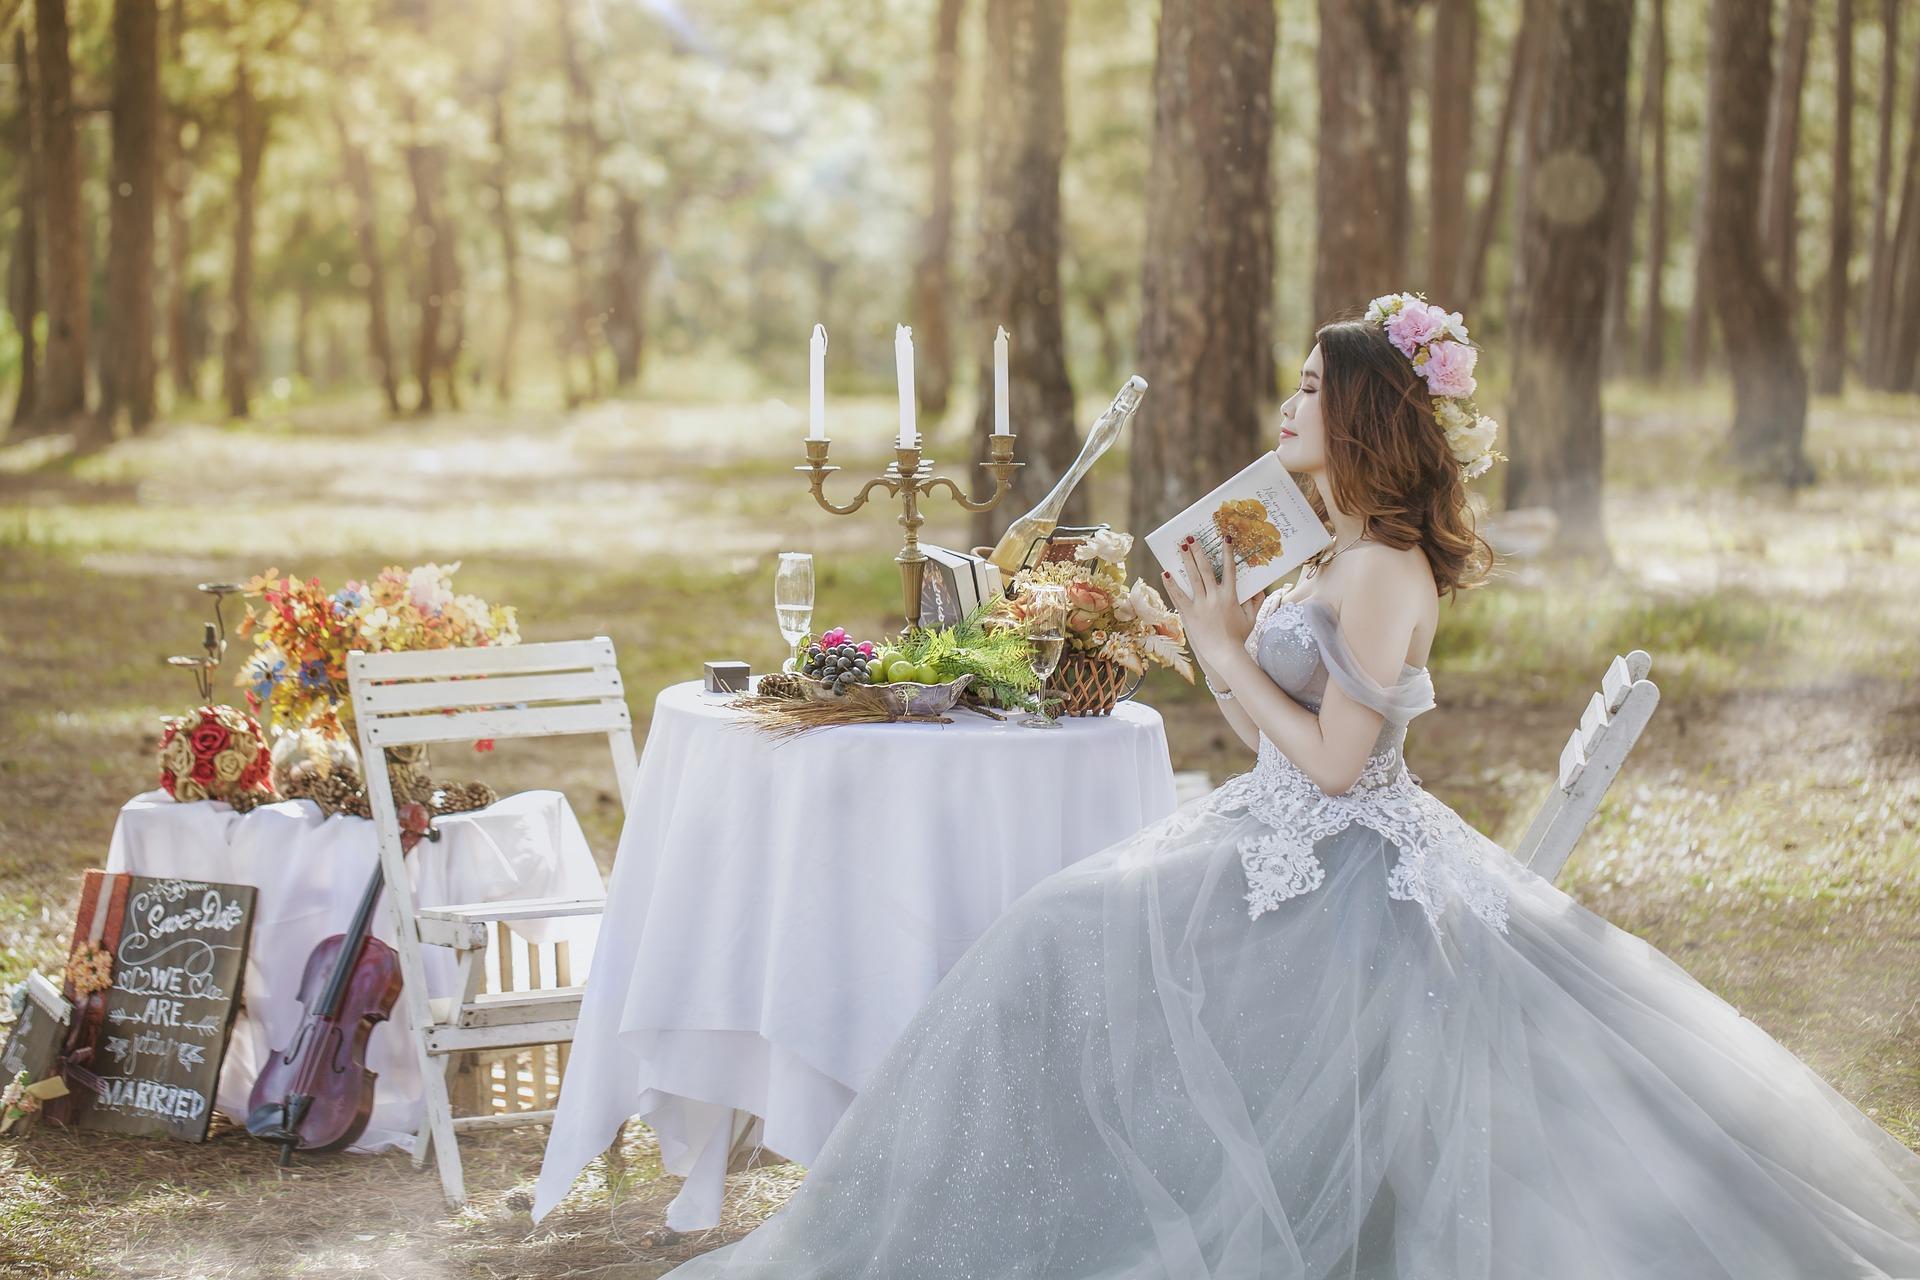 планируйте свадьбу вместе